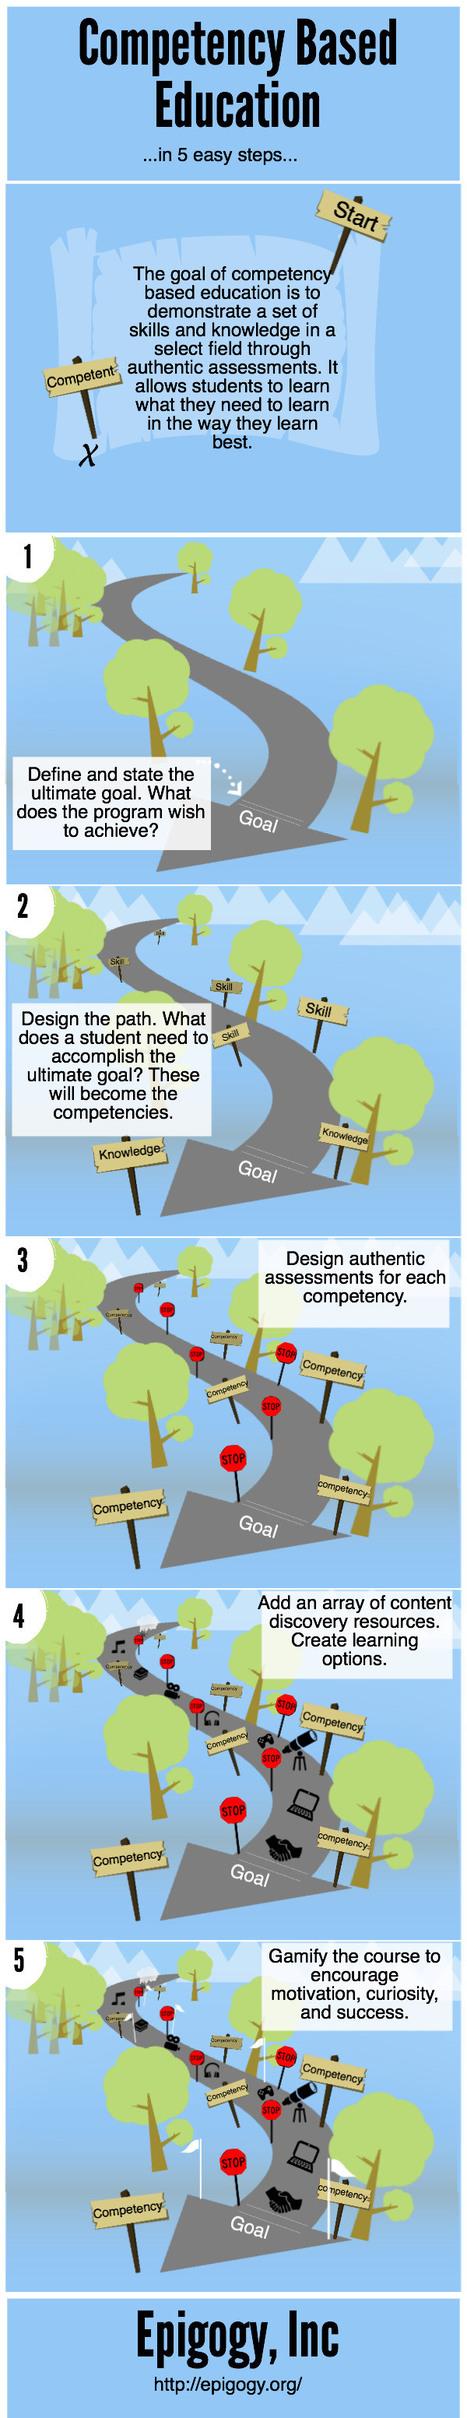 [Infografía] Competency Based Education visuall... | Educ8 Tech | Scoop.it